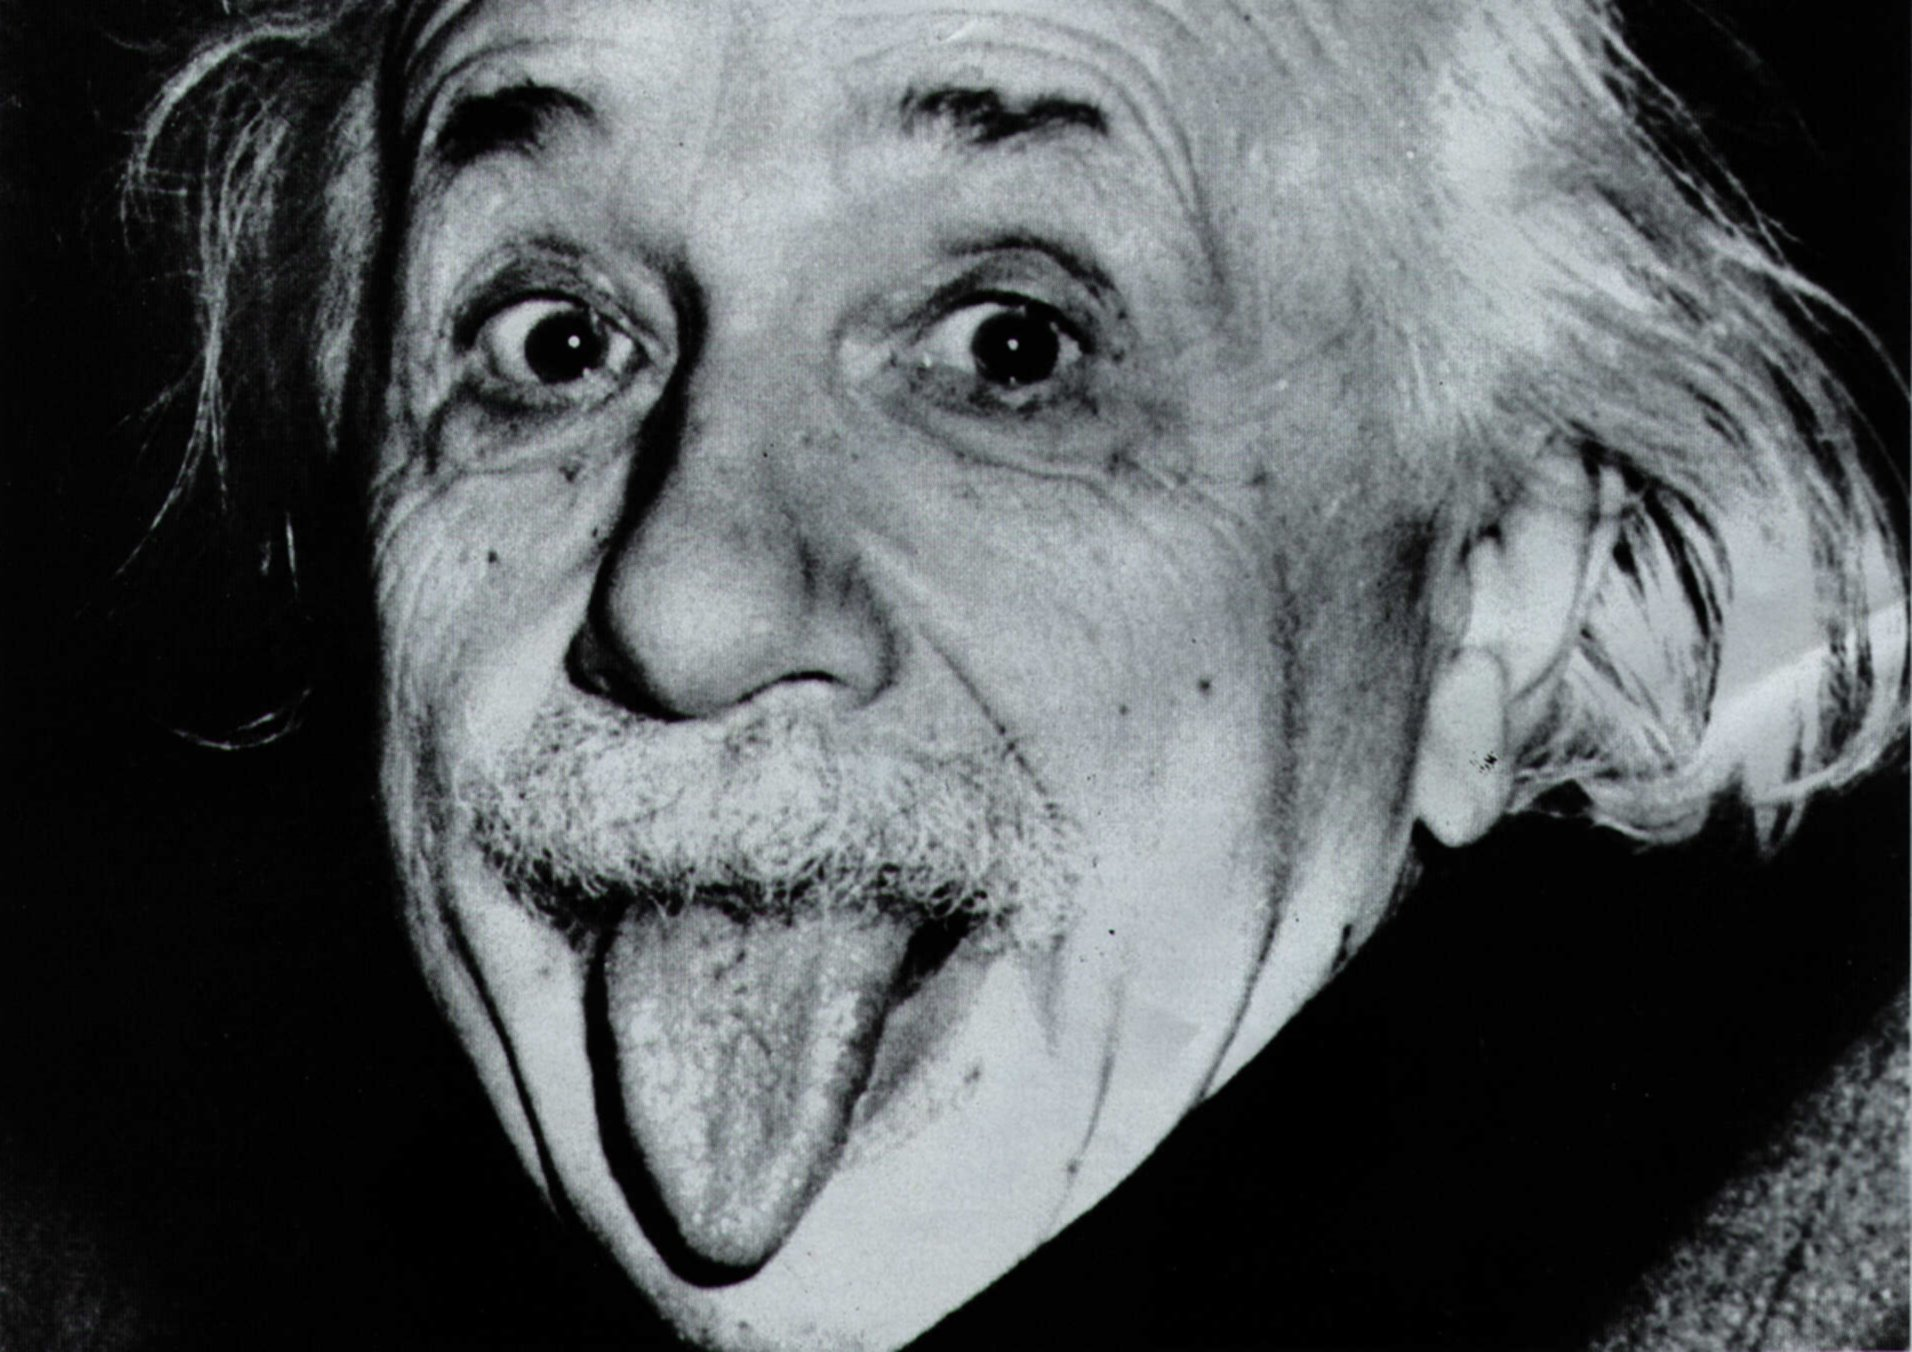 Albert clip art library. Einstein clipart tongue